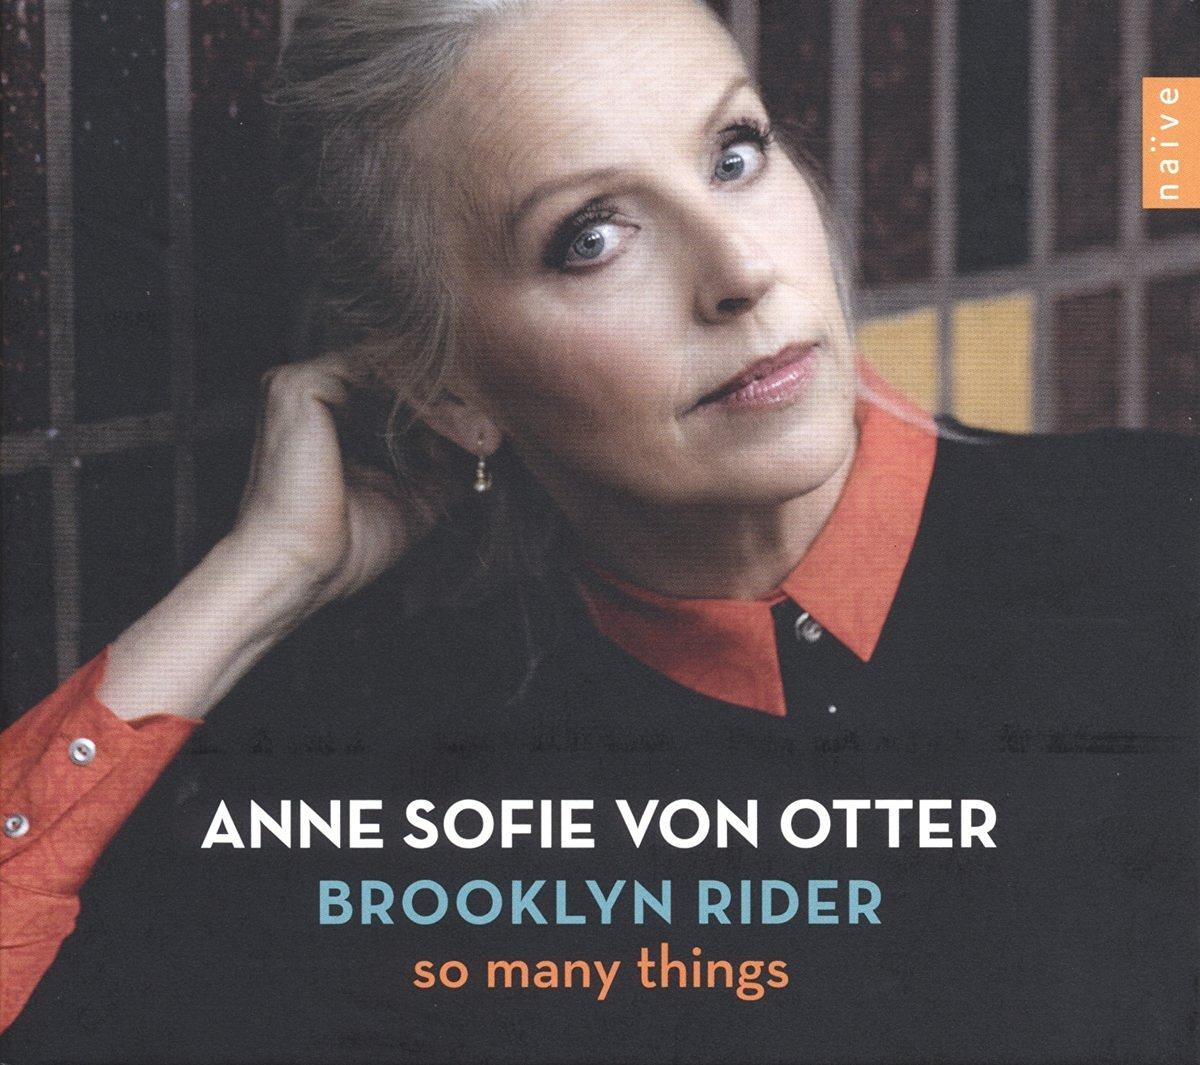 ANNE SOFIE VON OTTER & BROOKLYN RIDER - SO MANY THINGHS (CD)